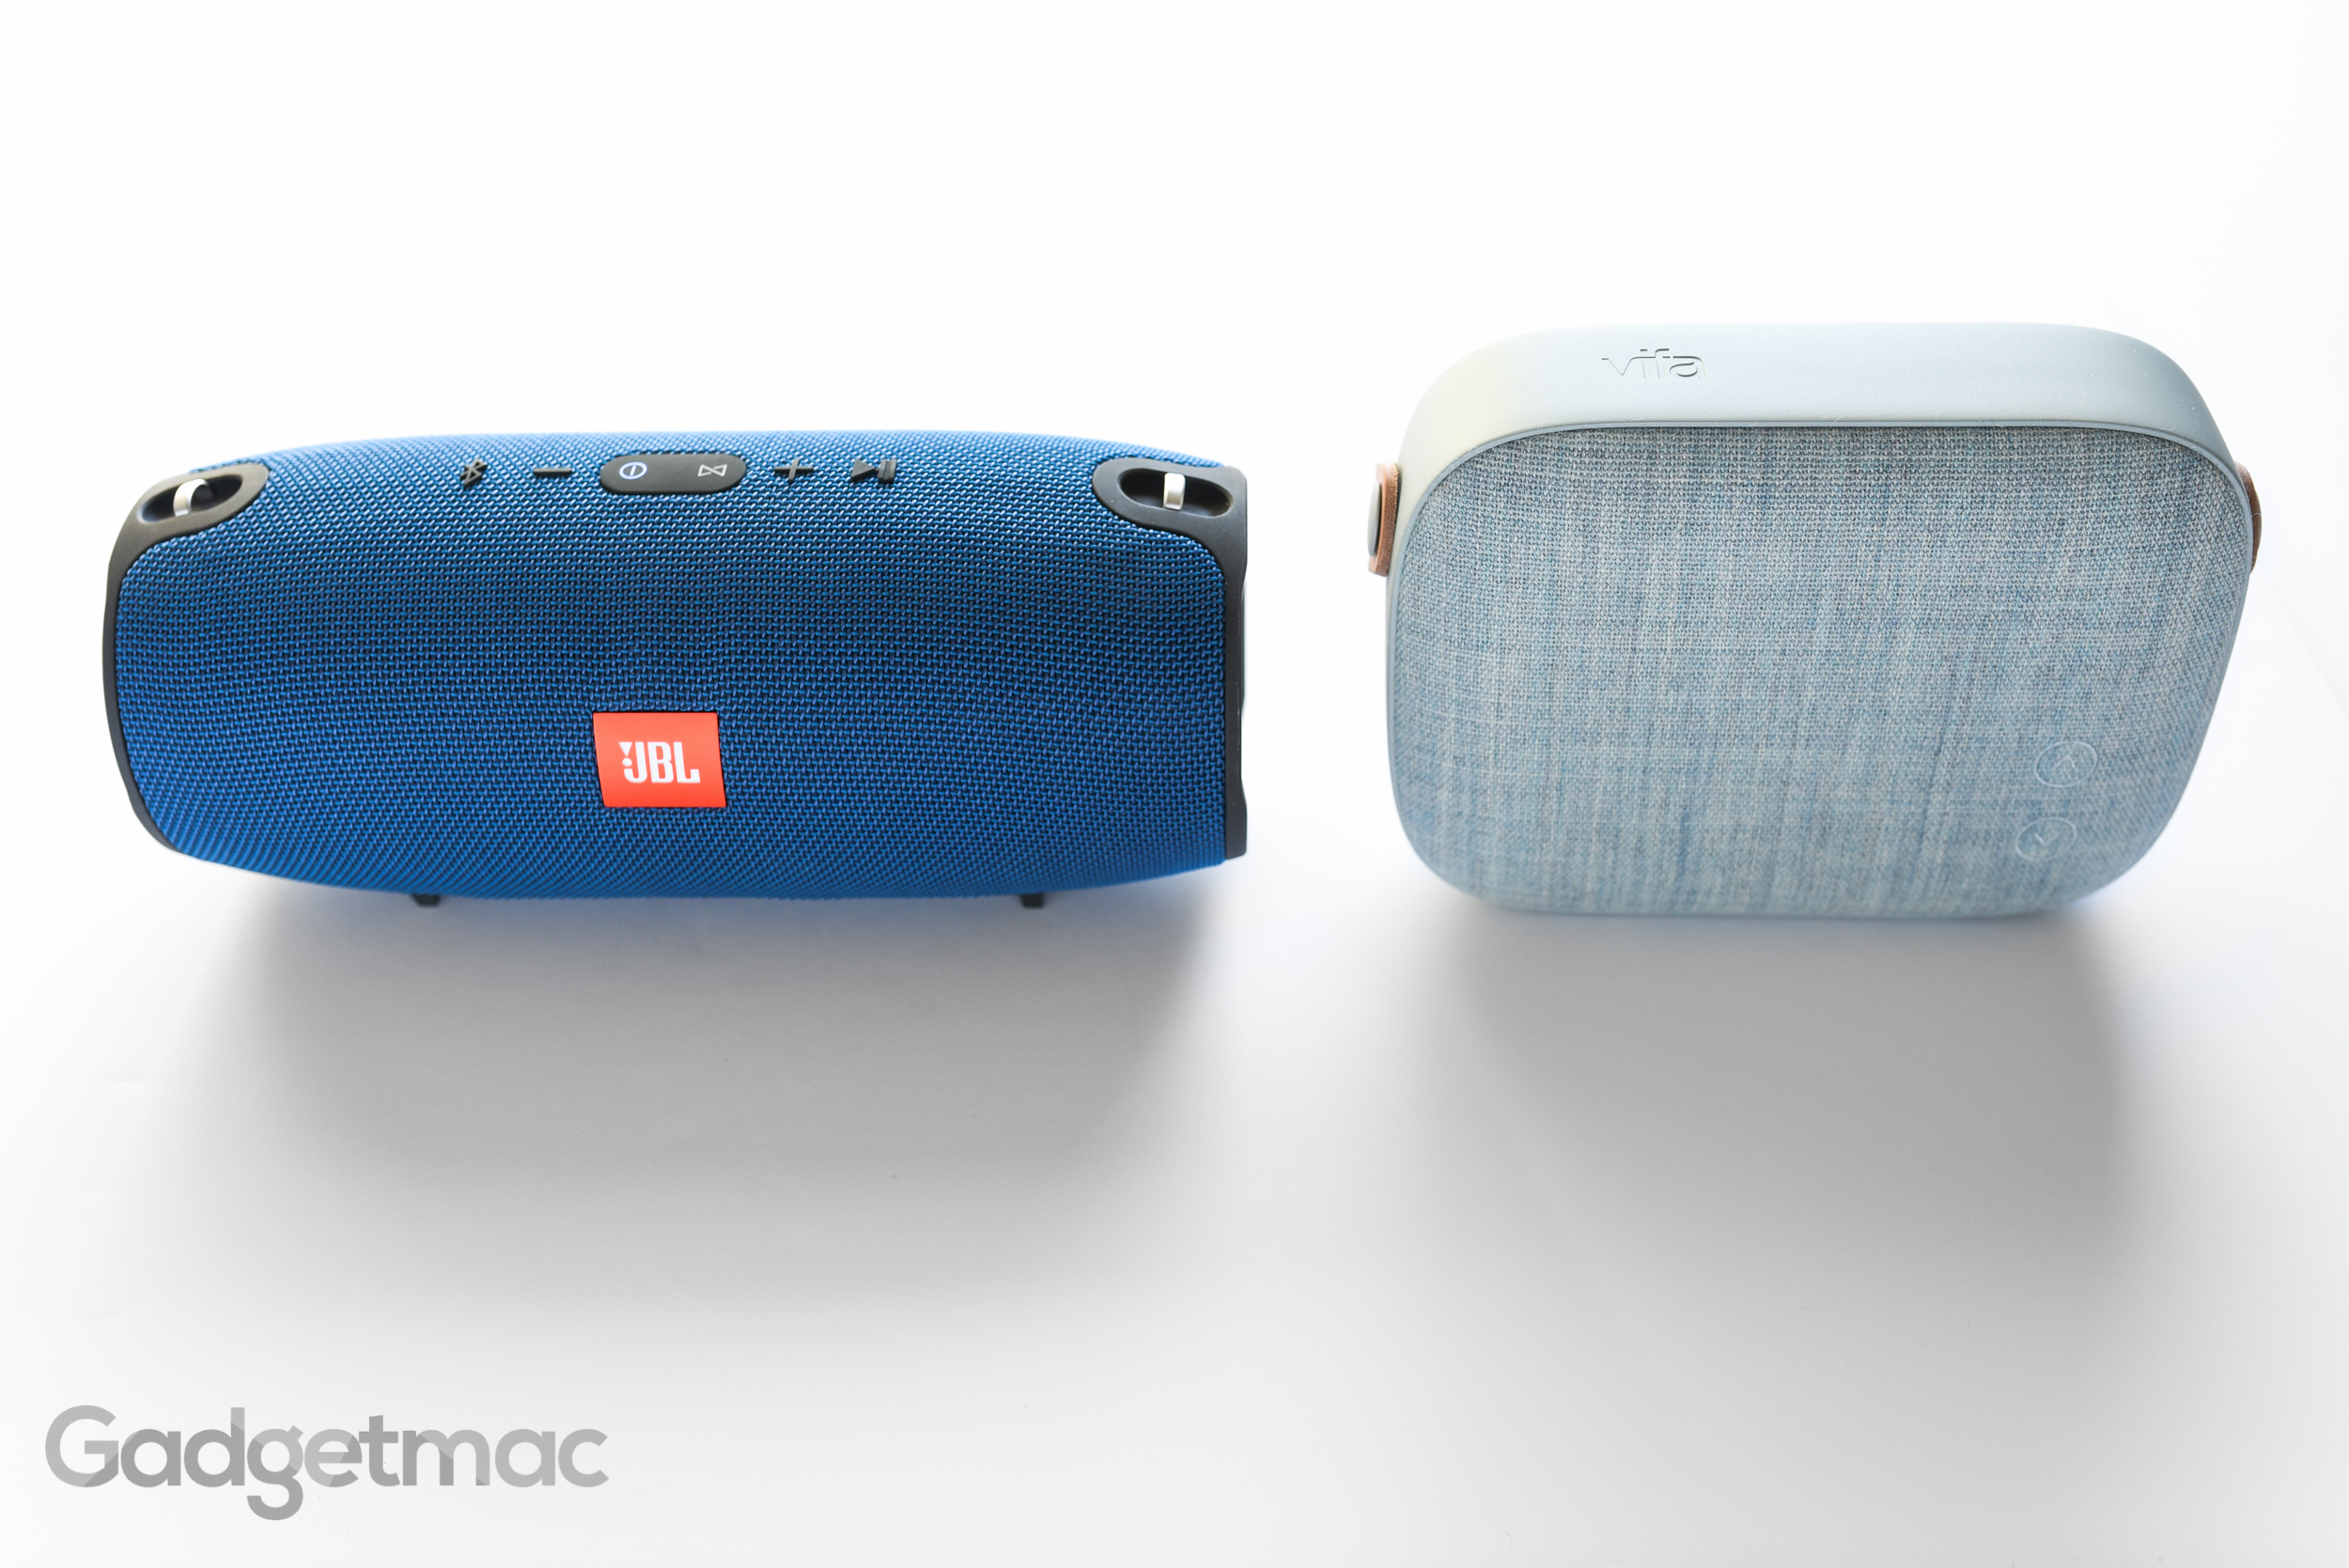 jbl-xtreme-vs-vifa-helsinki-portable-speaker.jpg